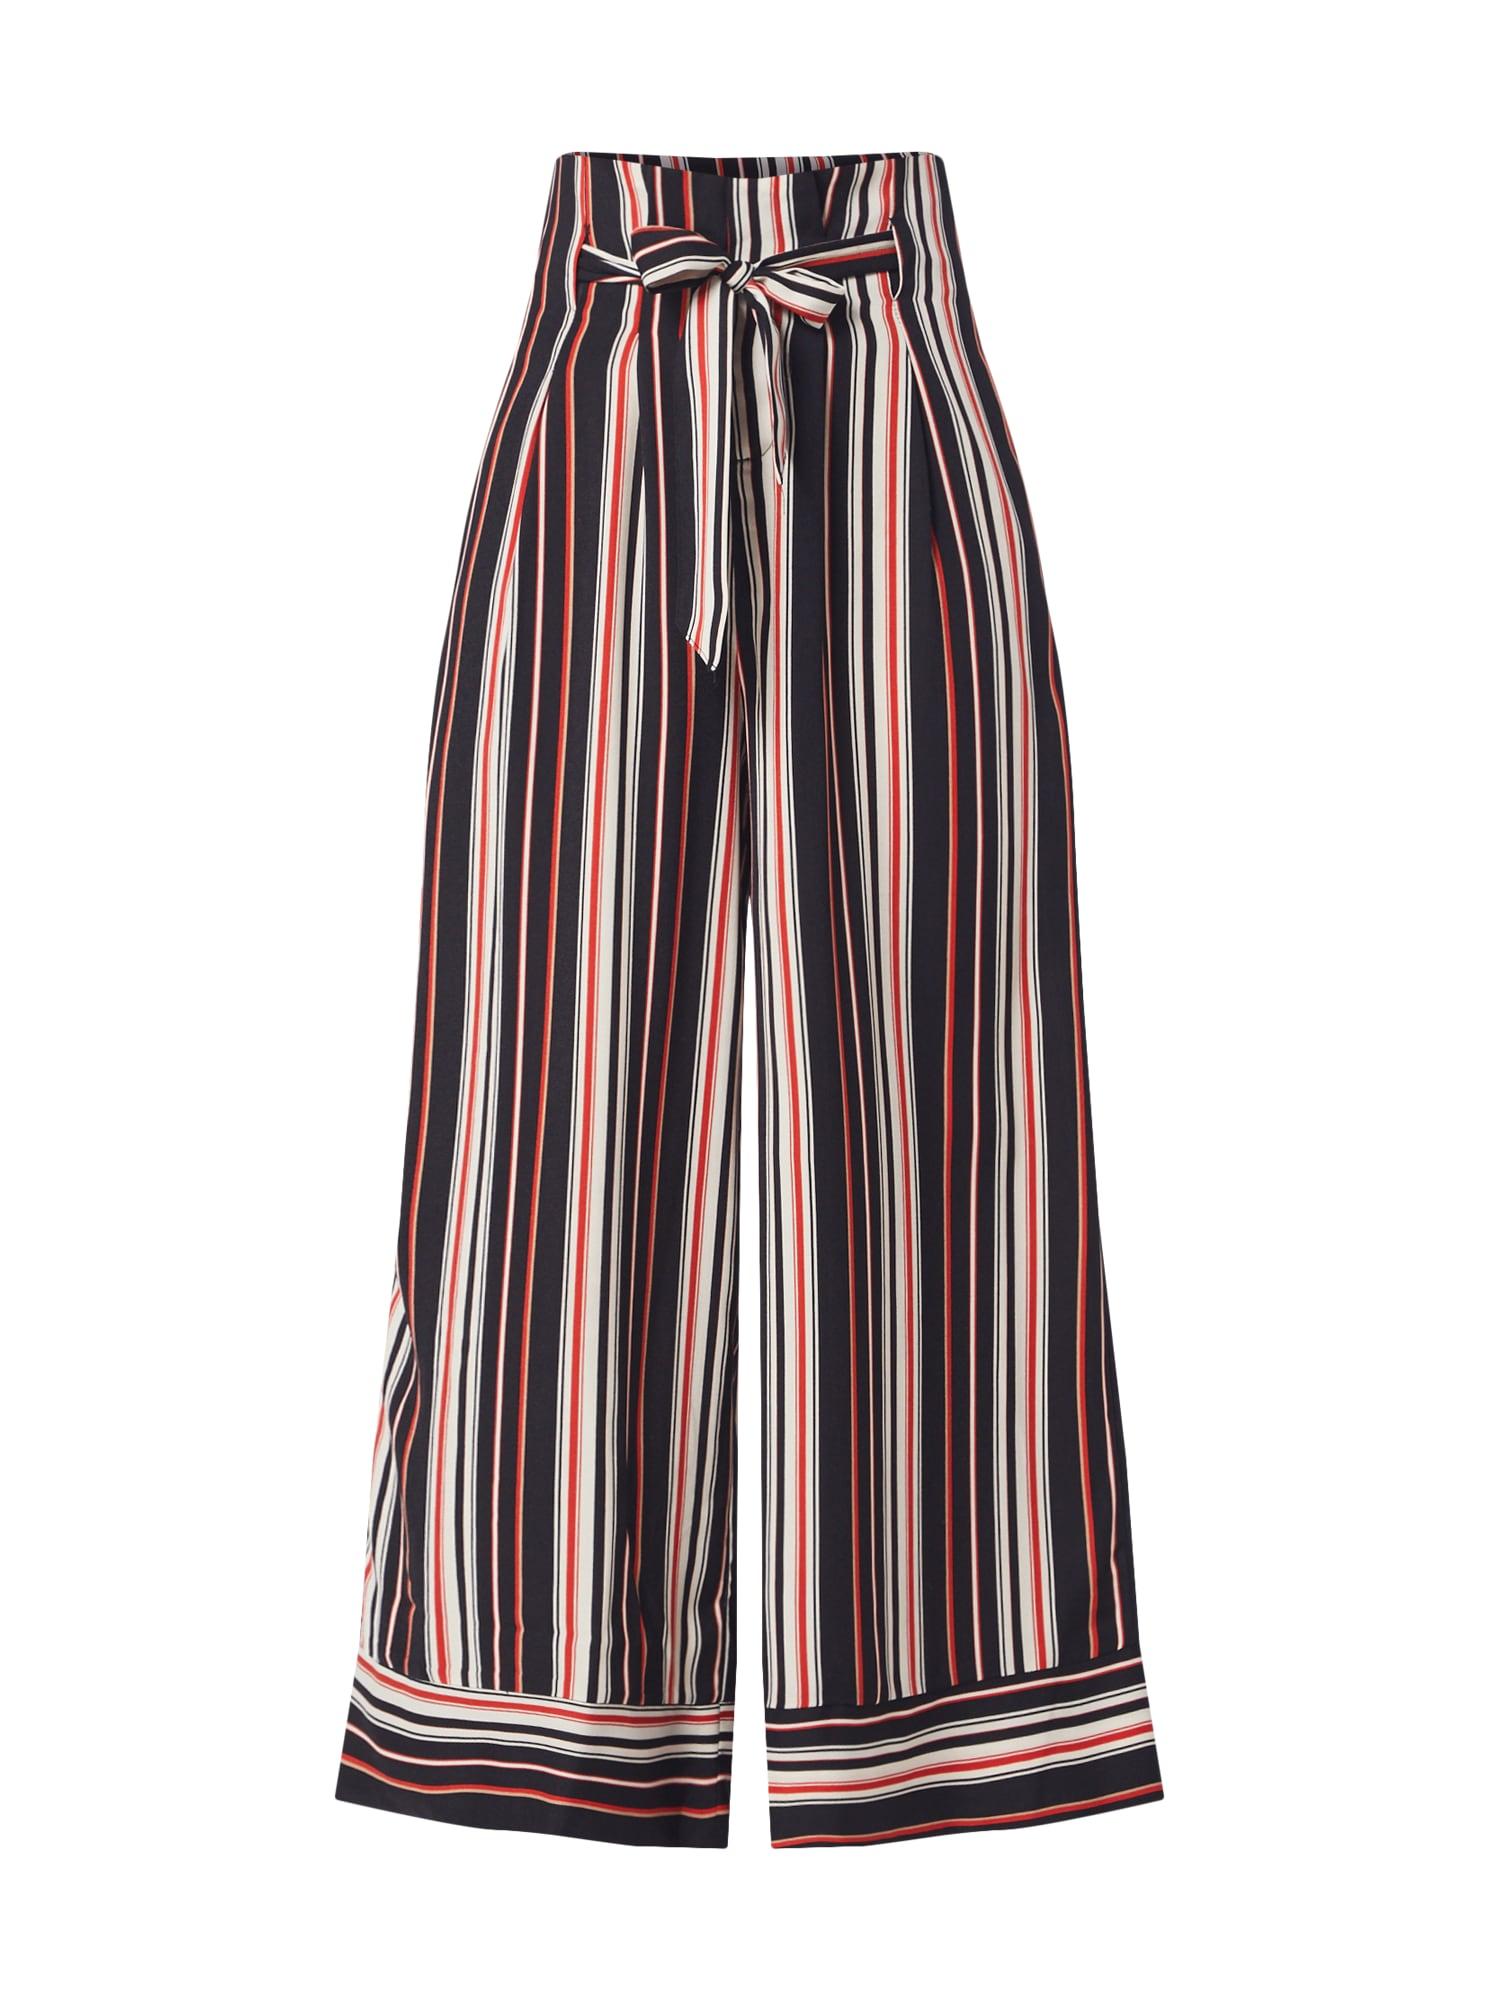 Kalhoty mix barev Parallel Lines